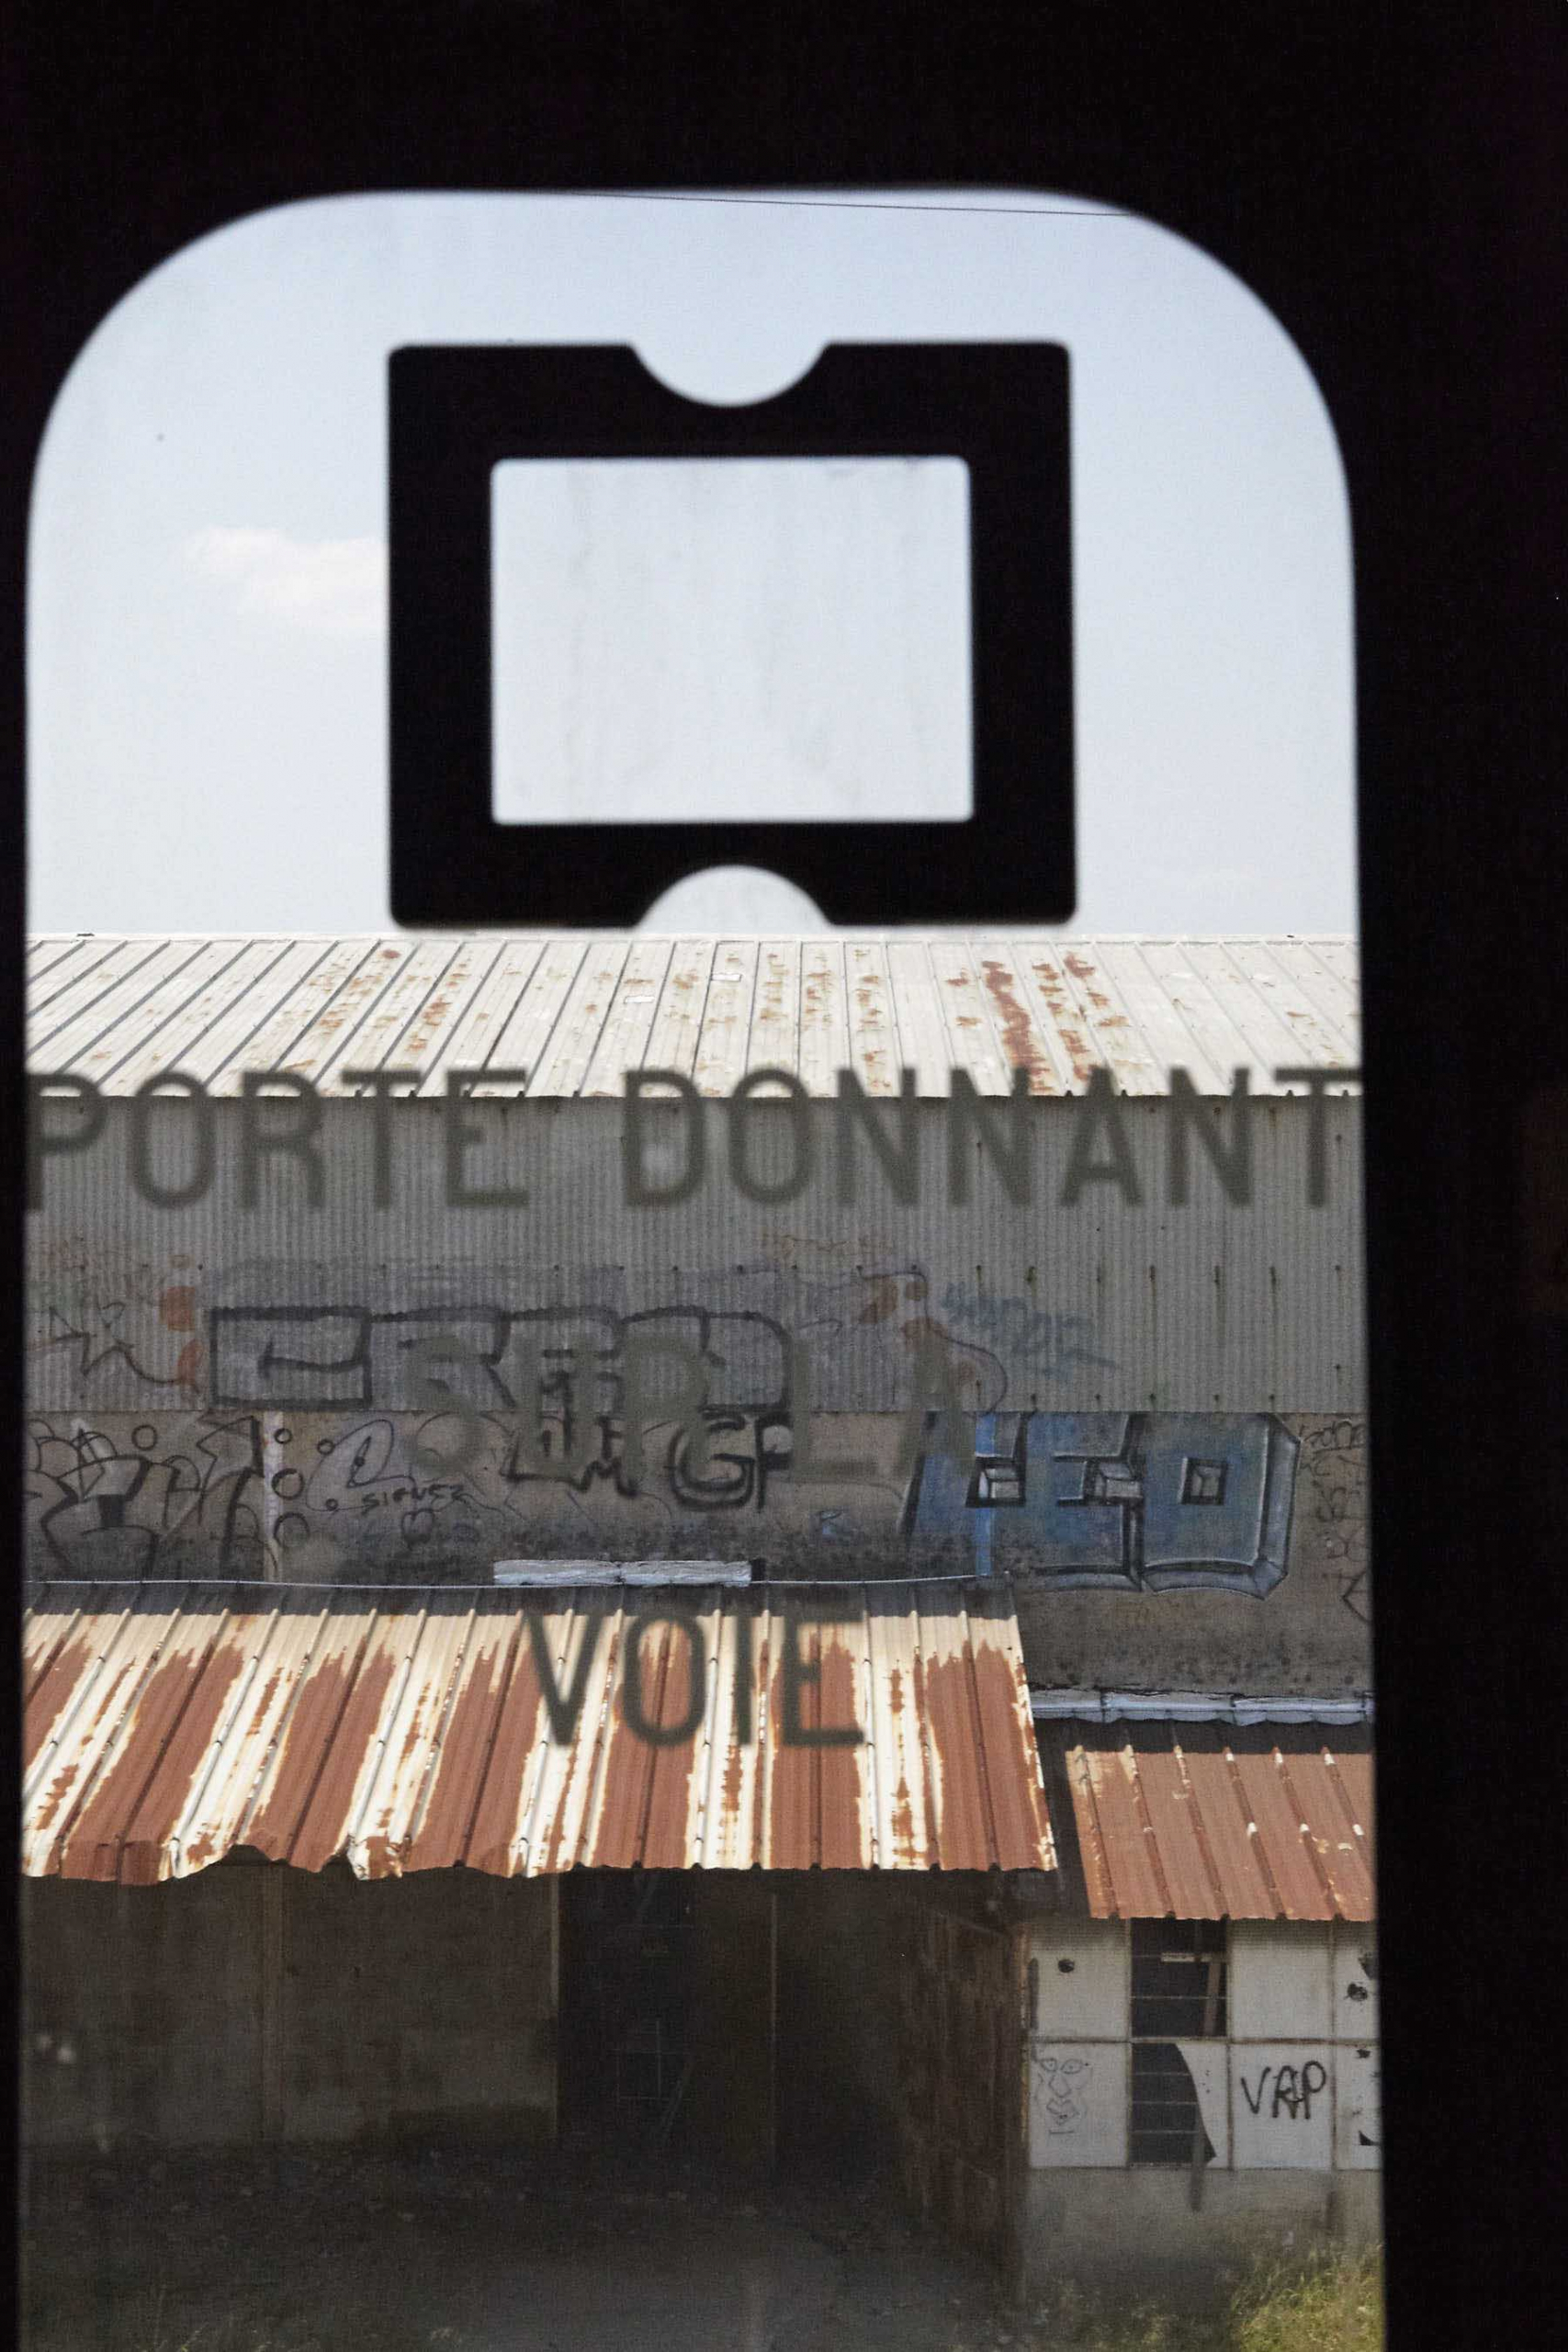 Paul Orenstein, Porte Donnant